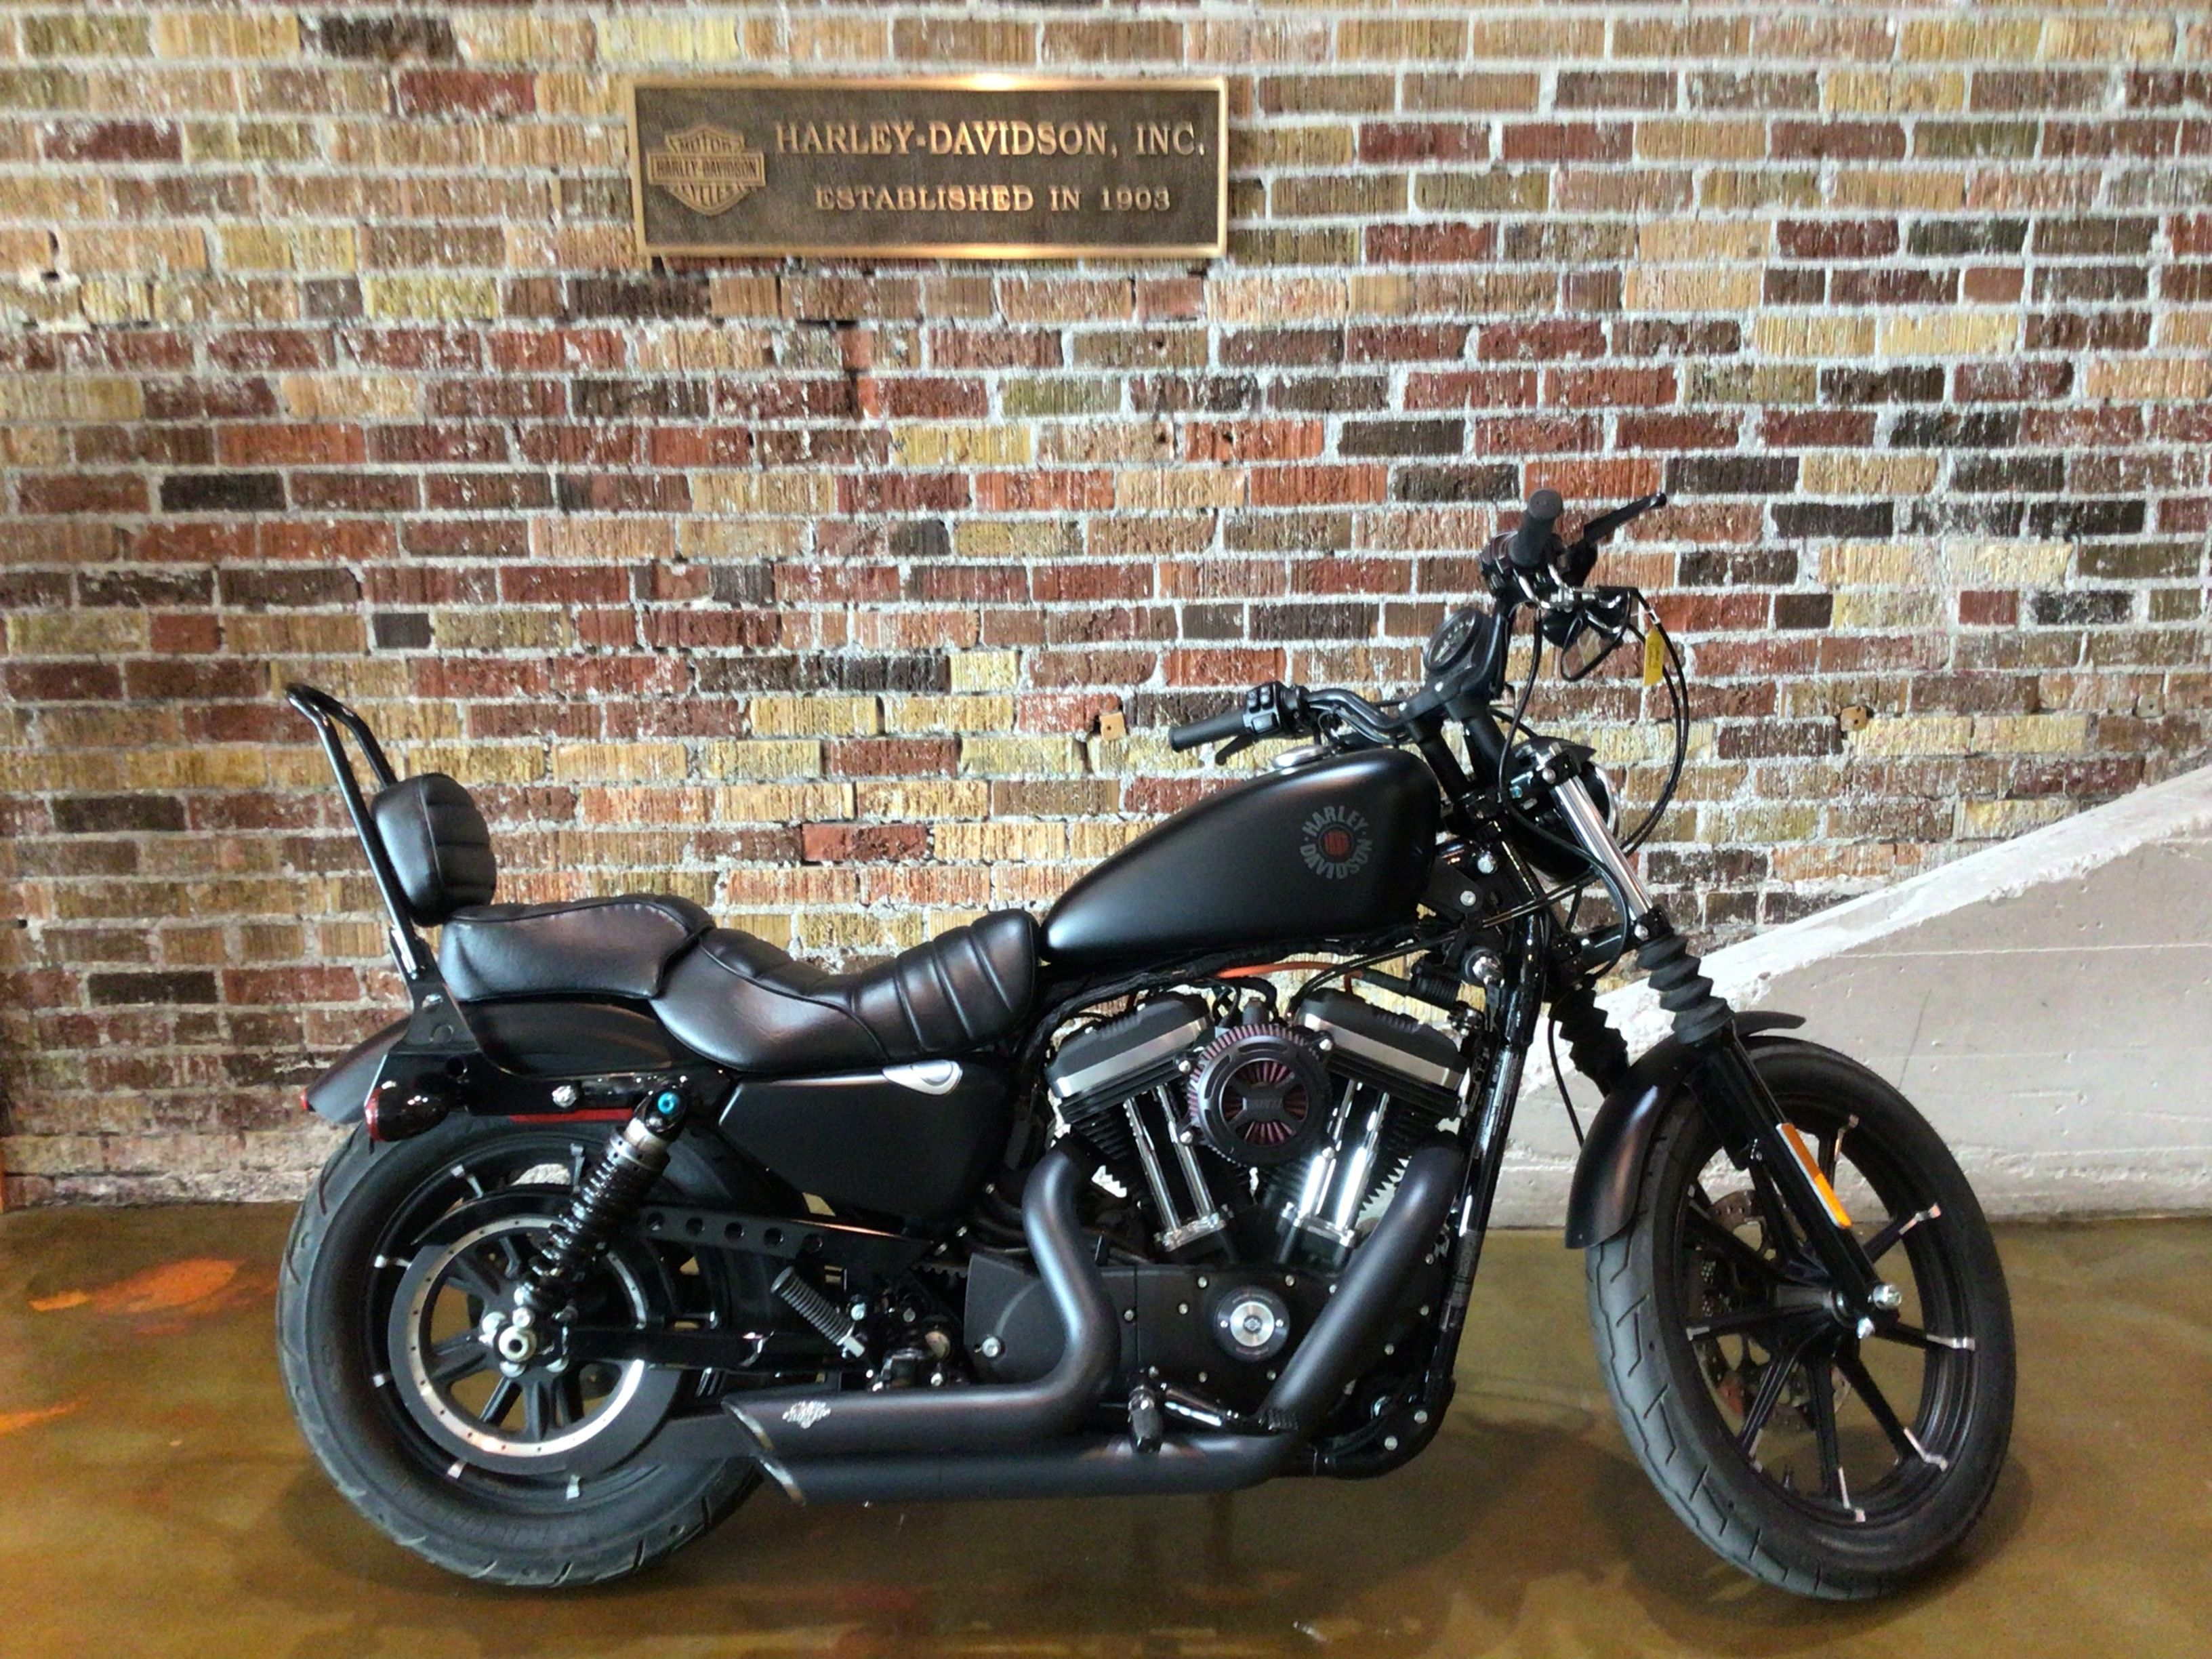 2020 Harley-Davidson Iron 883